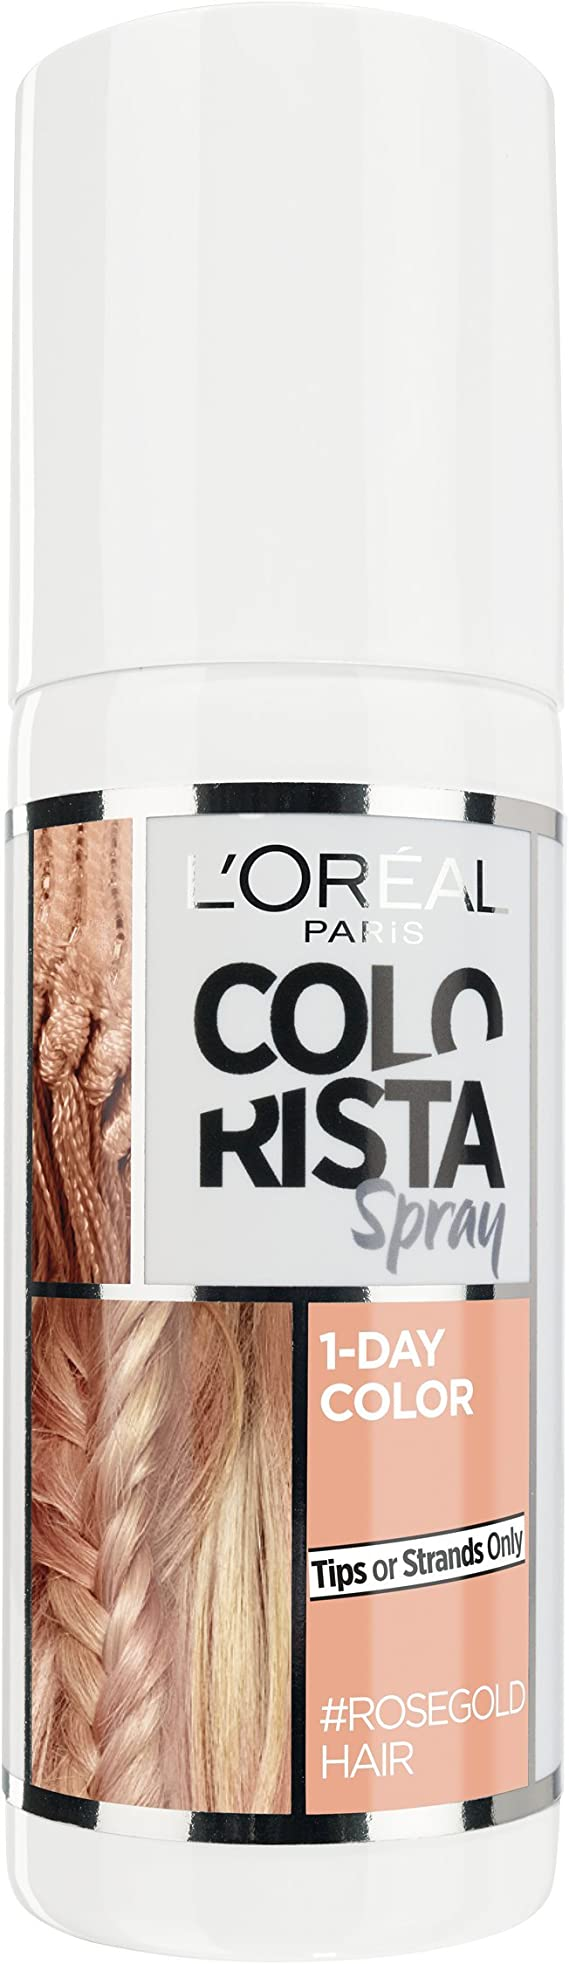 LOreal Paris Colorista Spray Rosa Oro Temporal Cabello Color 75ml